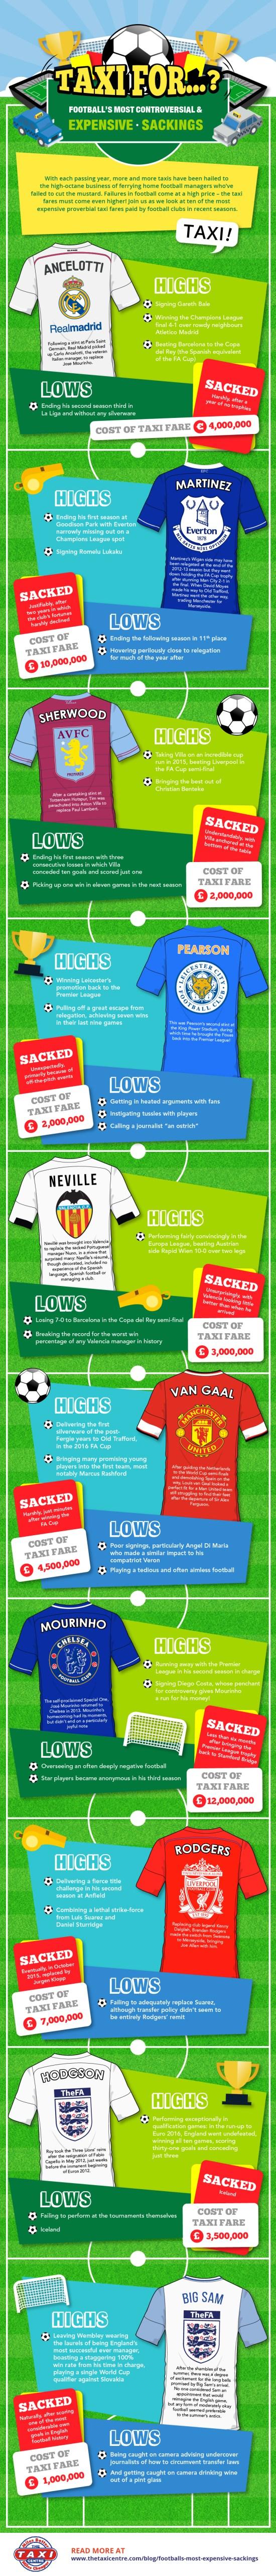 Football-Infographic-image